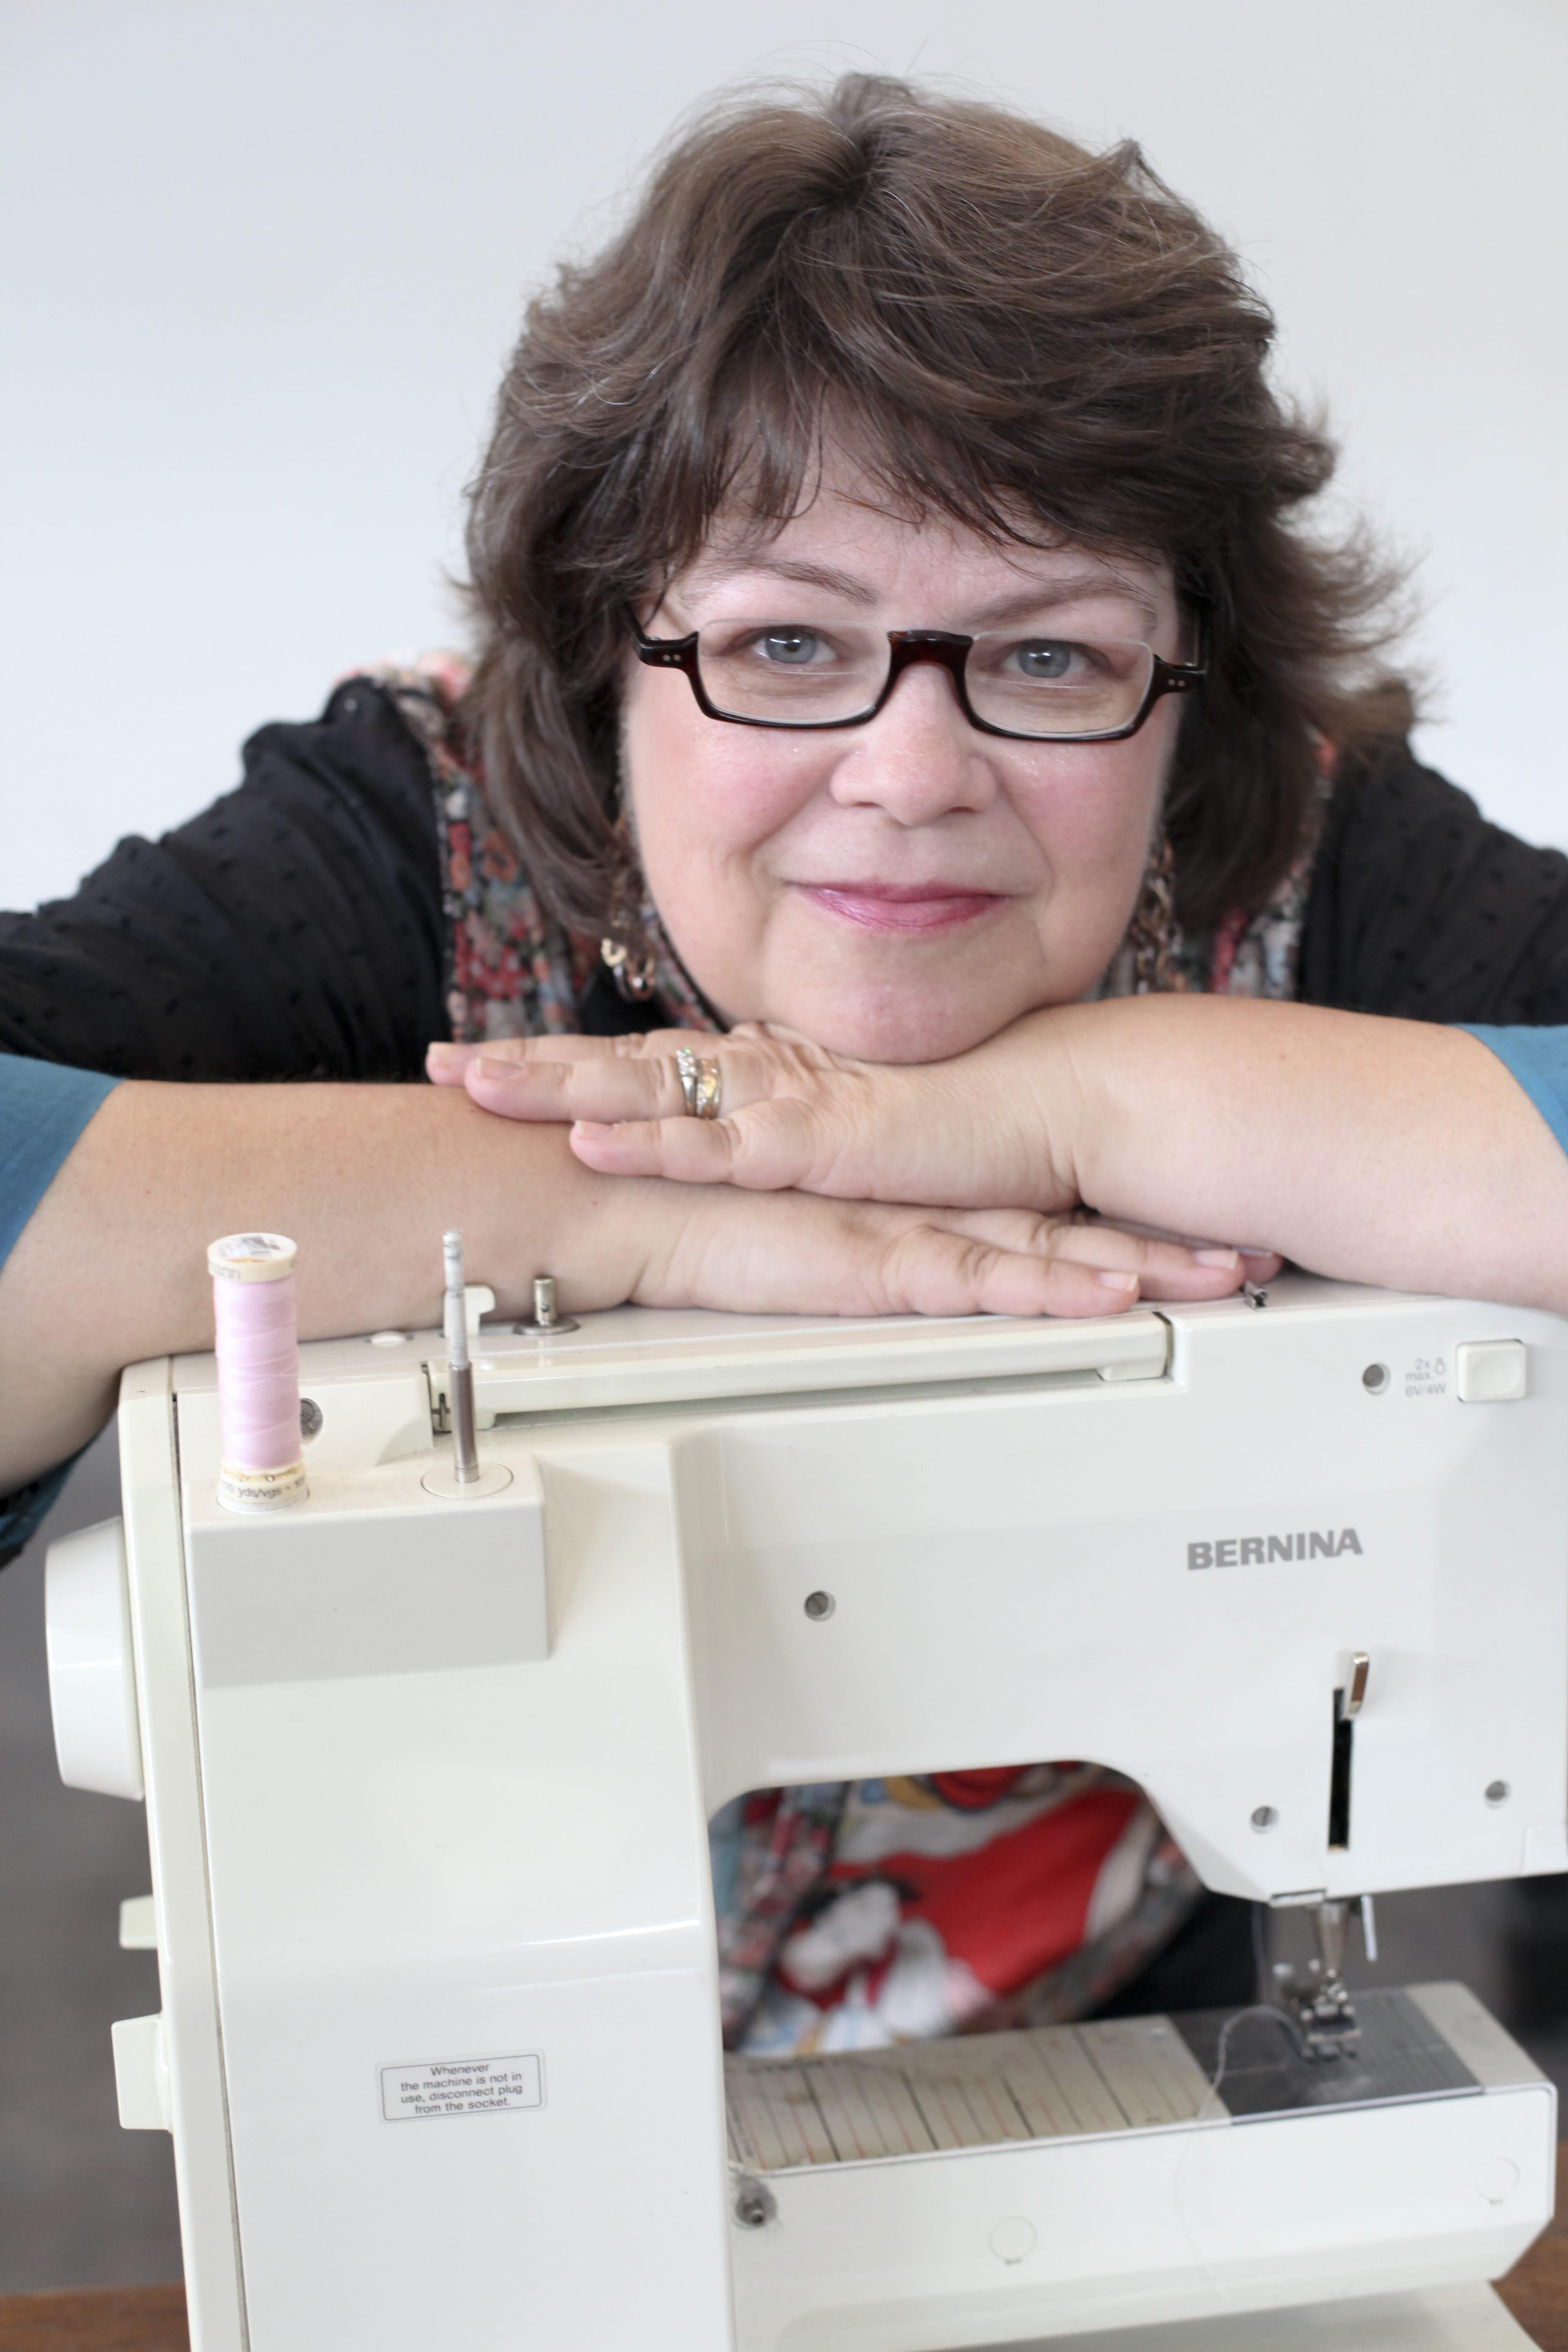 Rae - Hugging her sewing machine